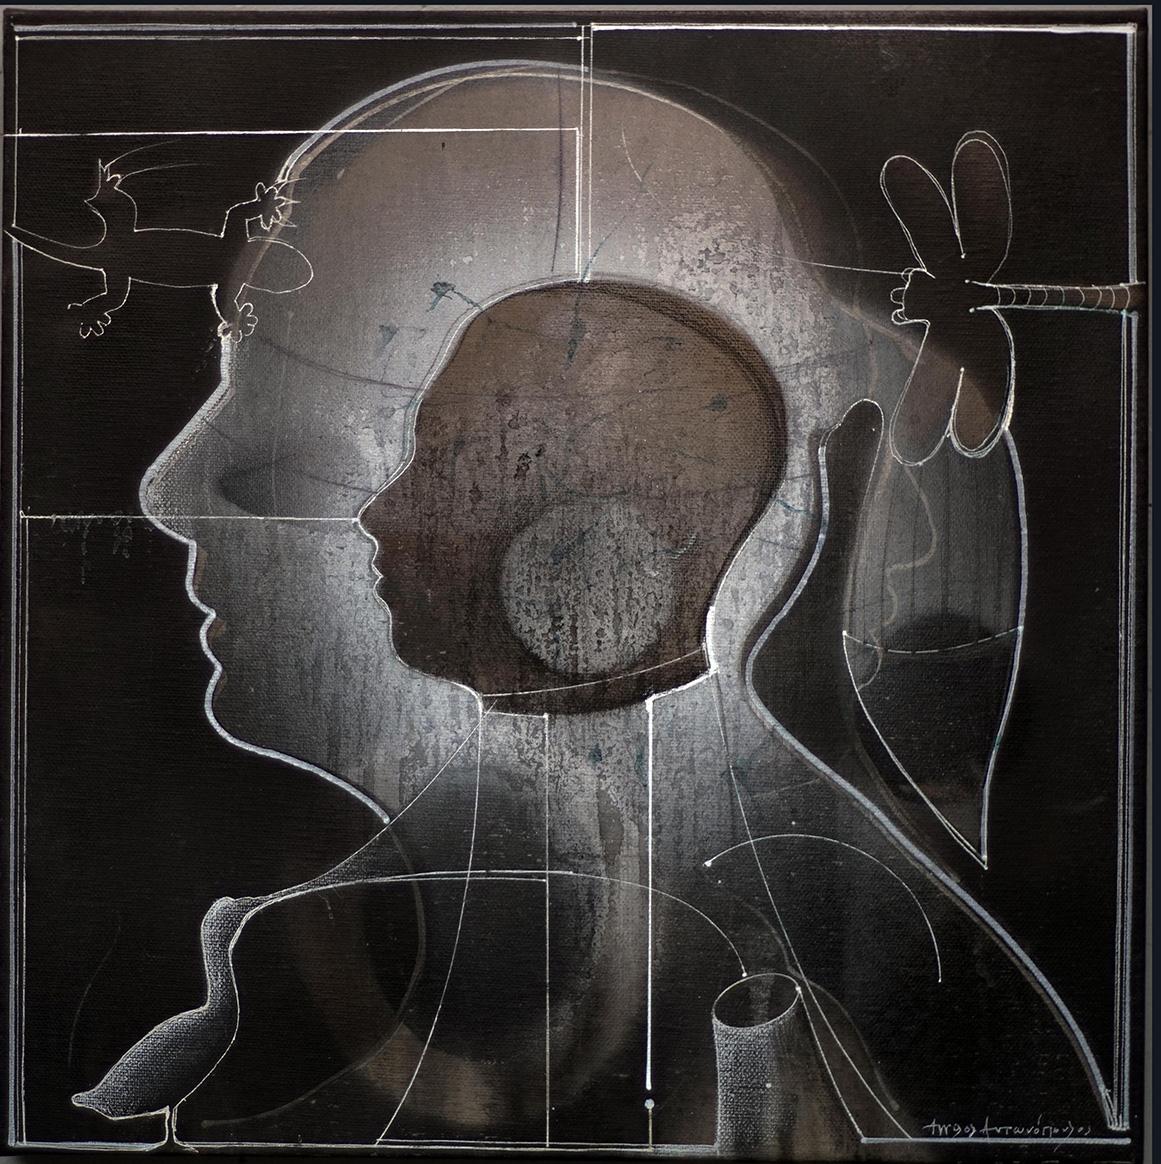 Aggelos Antonopoulos, Portrait I, 2019, acrylics on canvas, 40 x 40 cm